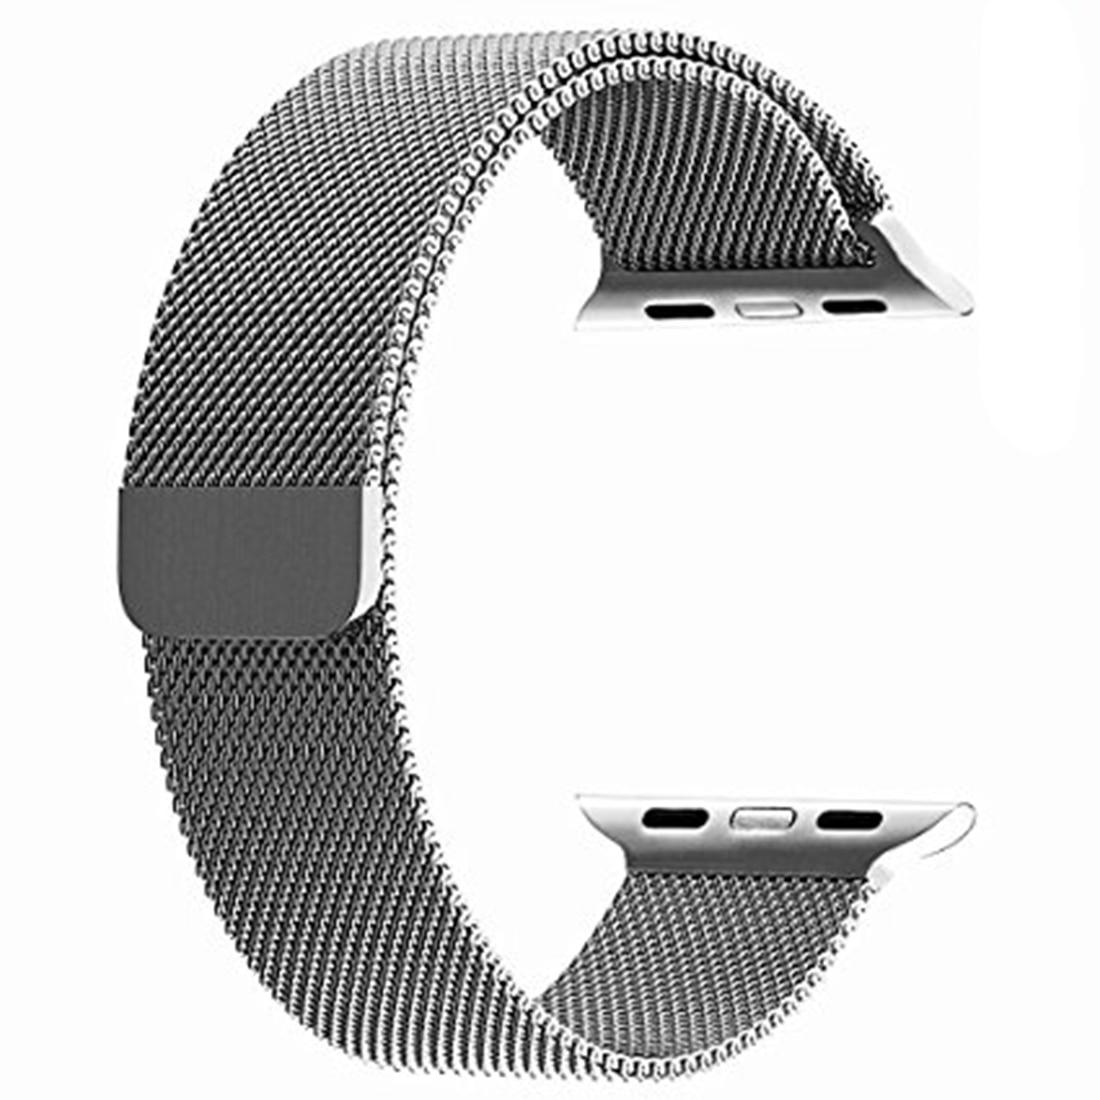 все цены на New Watchband 38mm 42mm Universal Watch Bands 316l Stainless Steel Metal Watch Band Fossil Strap Bracelet Black Rose Gold Silver онлайн